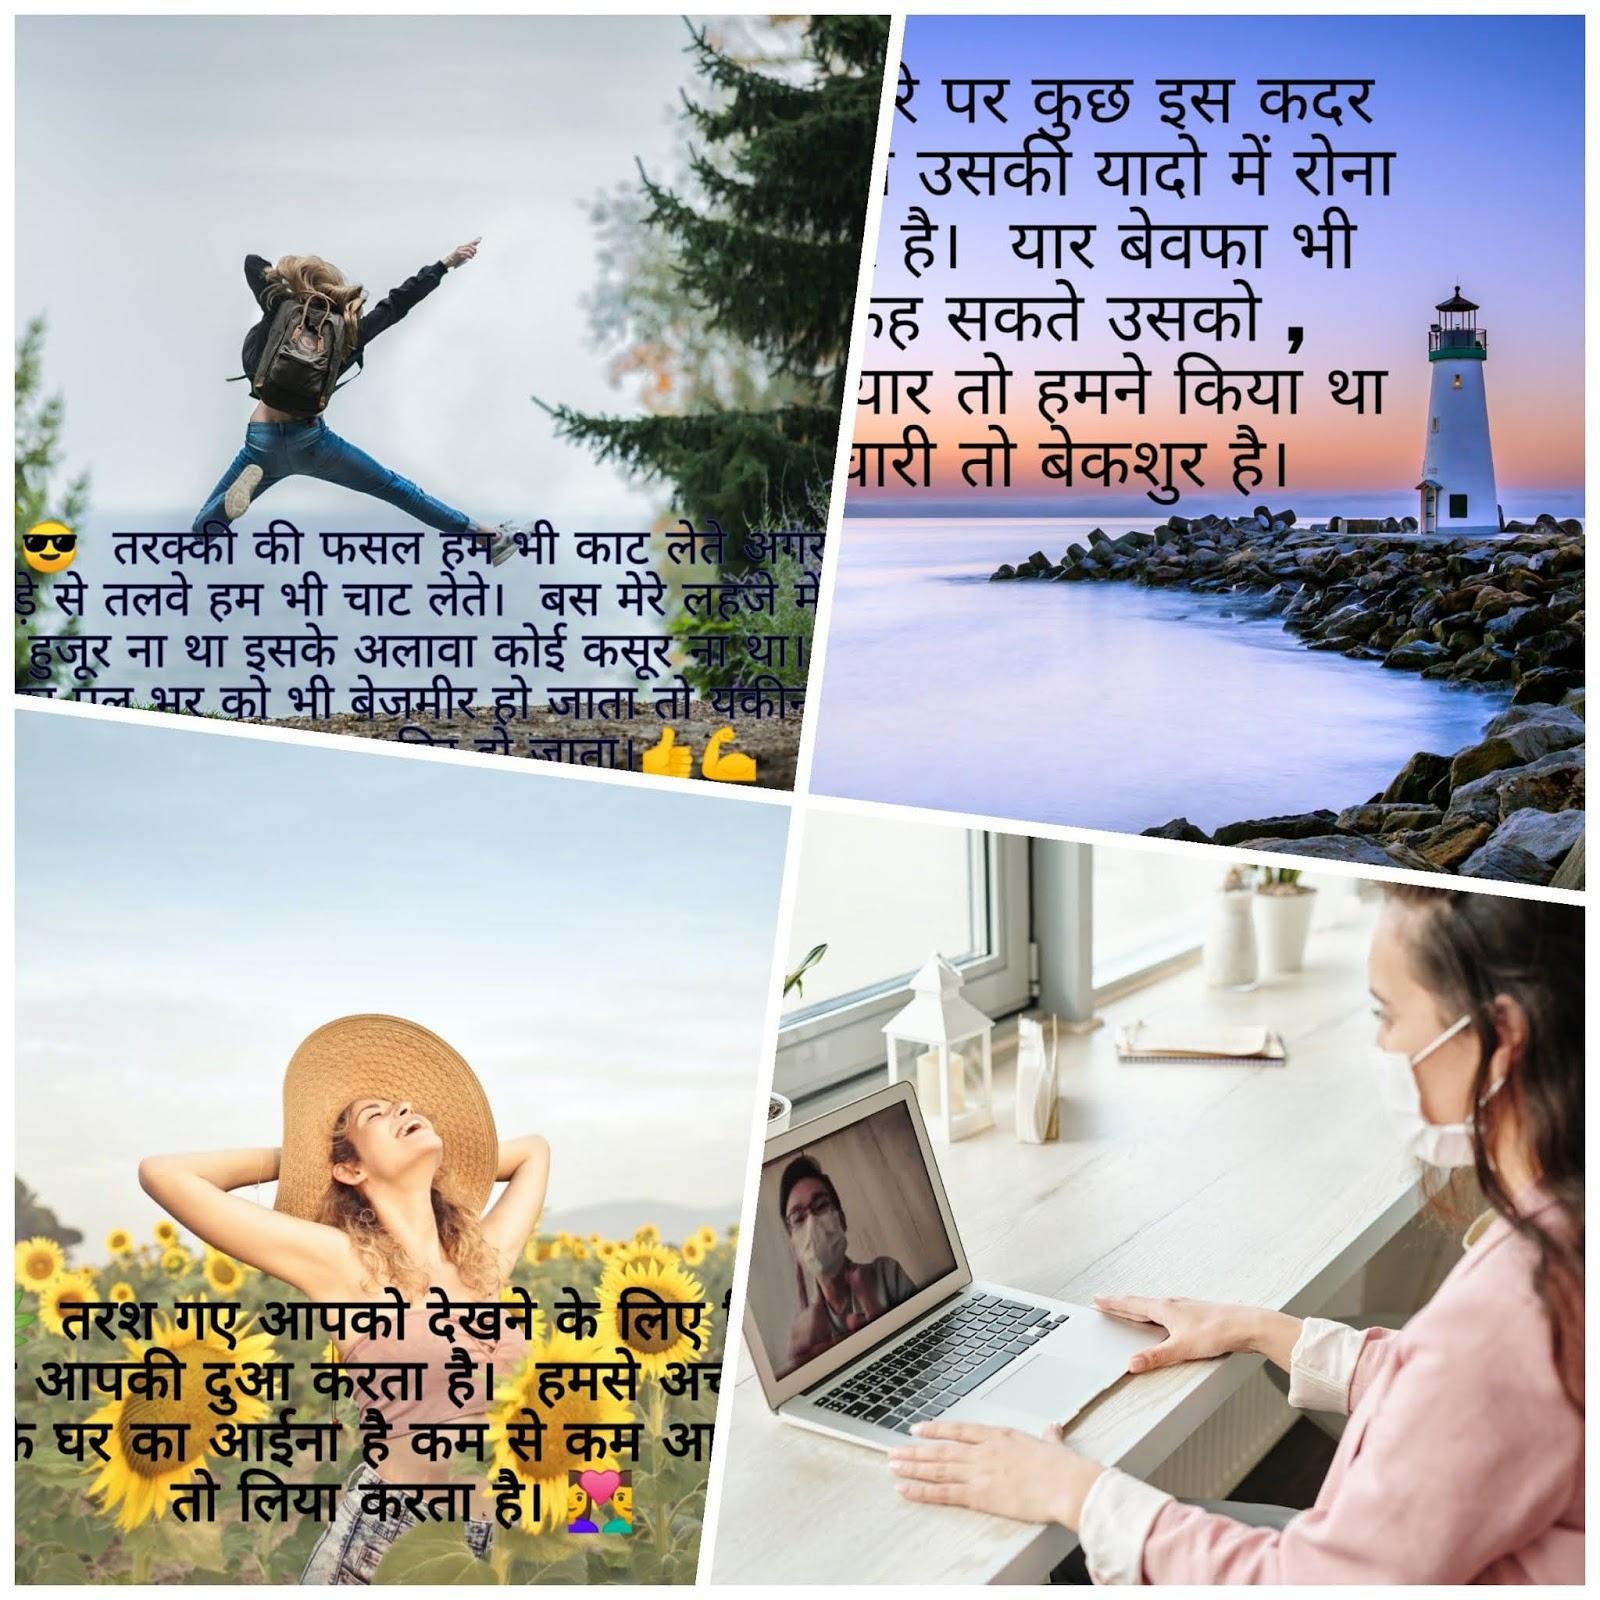 [100+ Best], Attitude Shayari in Hindi For Love 2021, download